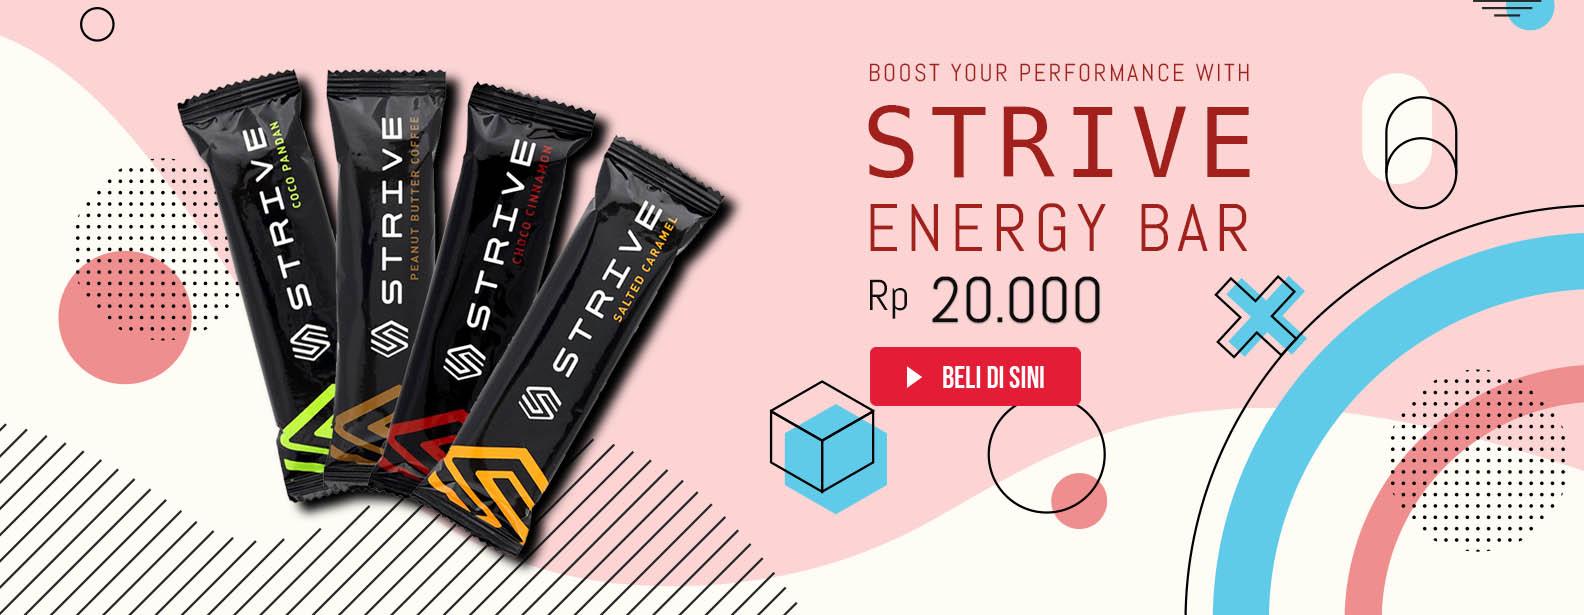 Strive Energy Bar